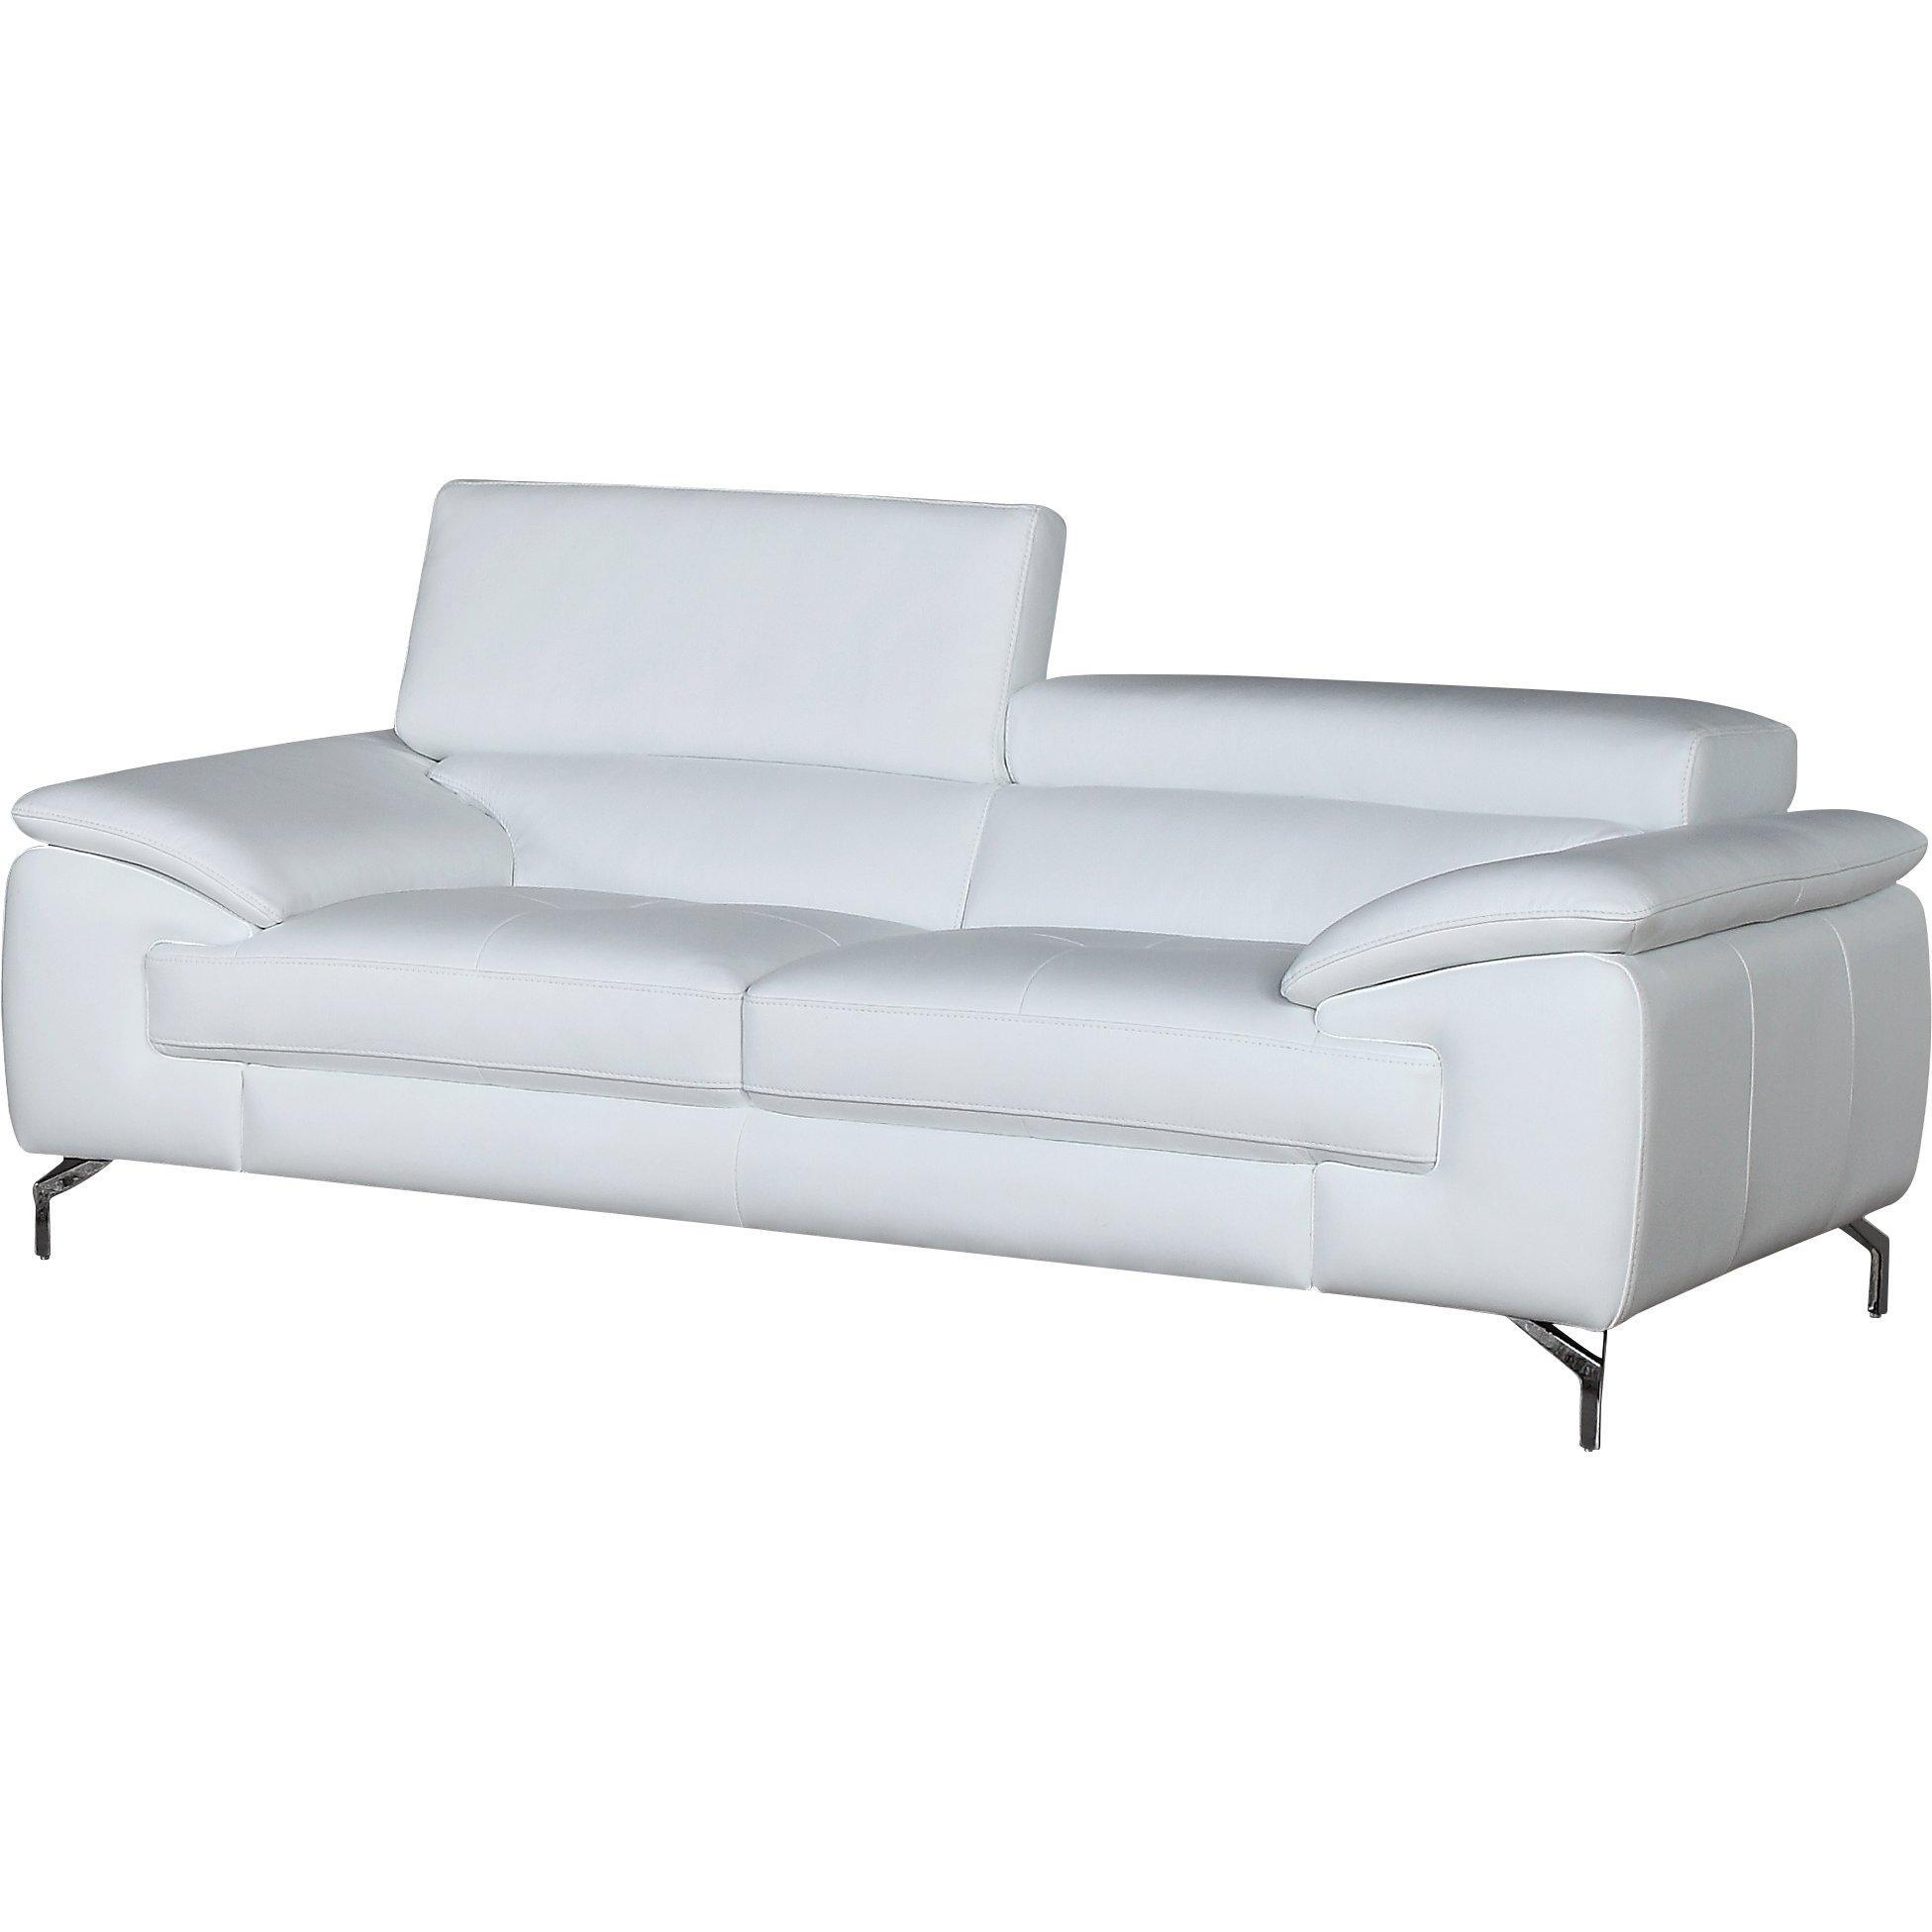 Wade Logan Gideon Italian Leather Sofa & Reviews | Wayfair Supply With Regard To Italian Leather Sofas (View 17 of 20)